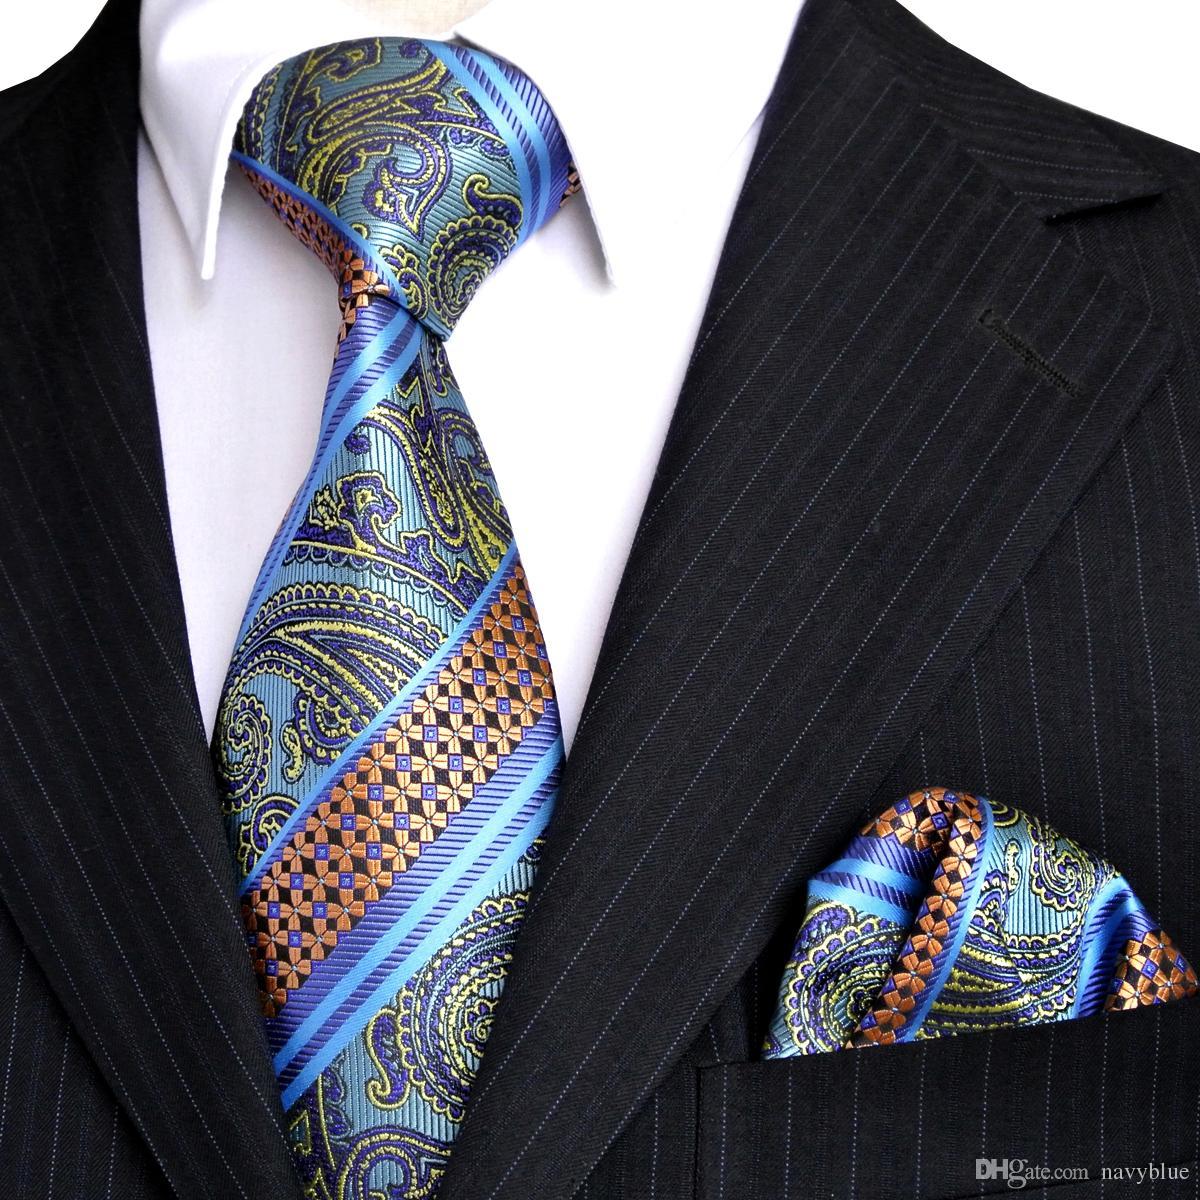 f55f554ba52f E3 Stripes Paisley Multicolor Blue Dark Turquoise Orange Mens Ties Set  Neckties Pocket Square 100% Silk Jacquard Woven UK 2019 From Navyblue, ...